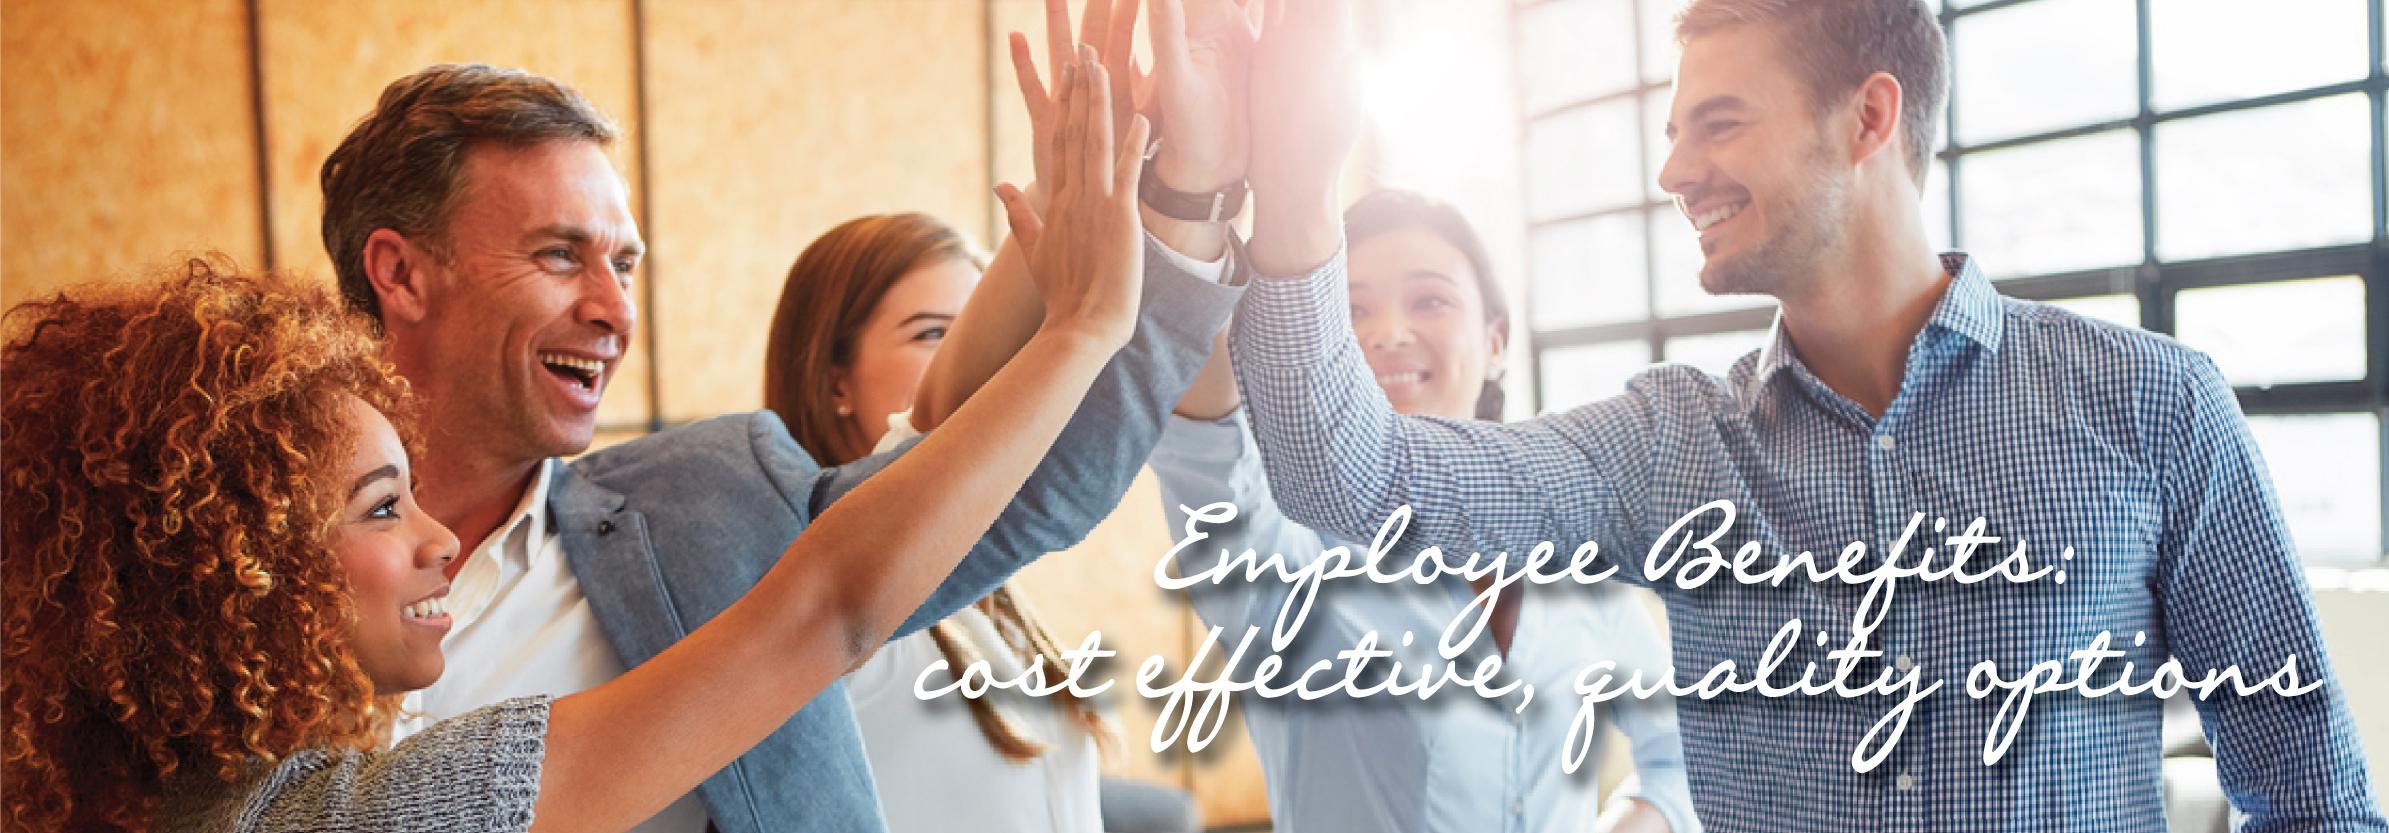 Employee-Benefitsnew